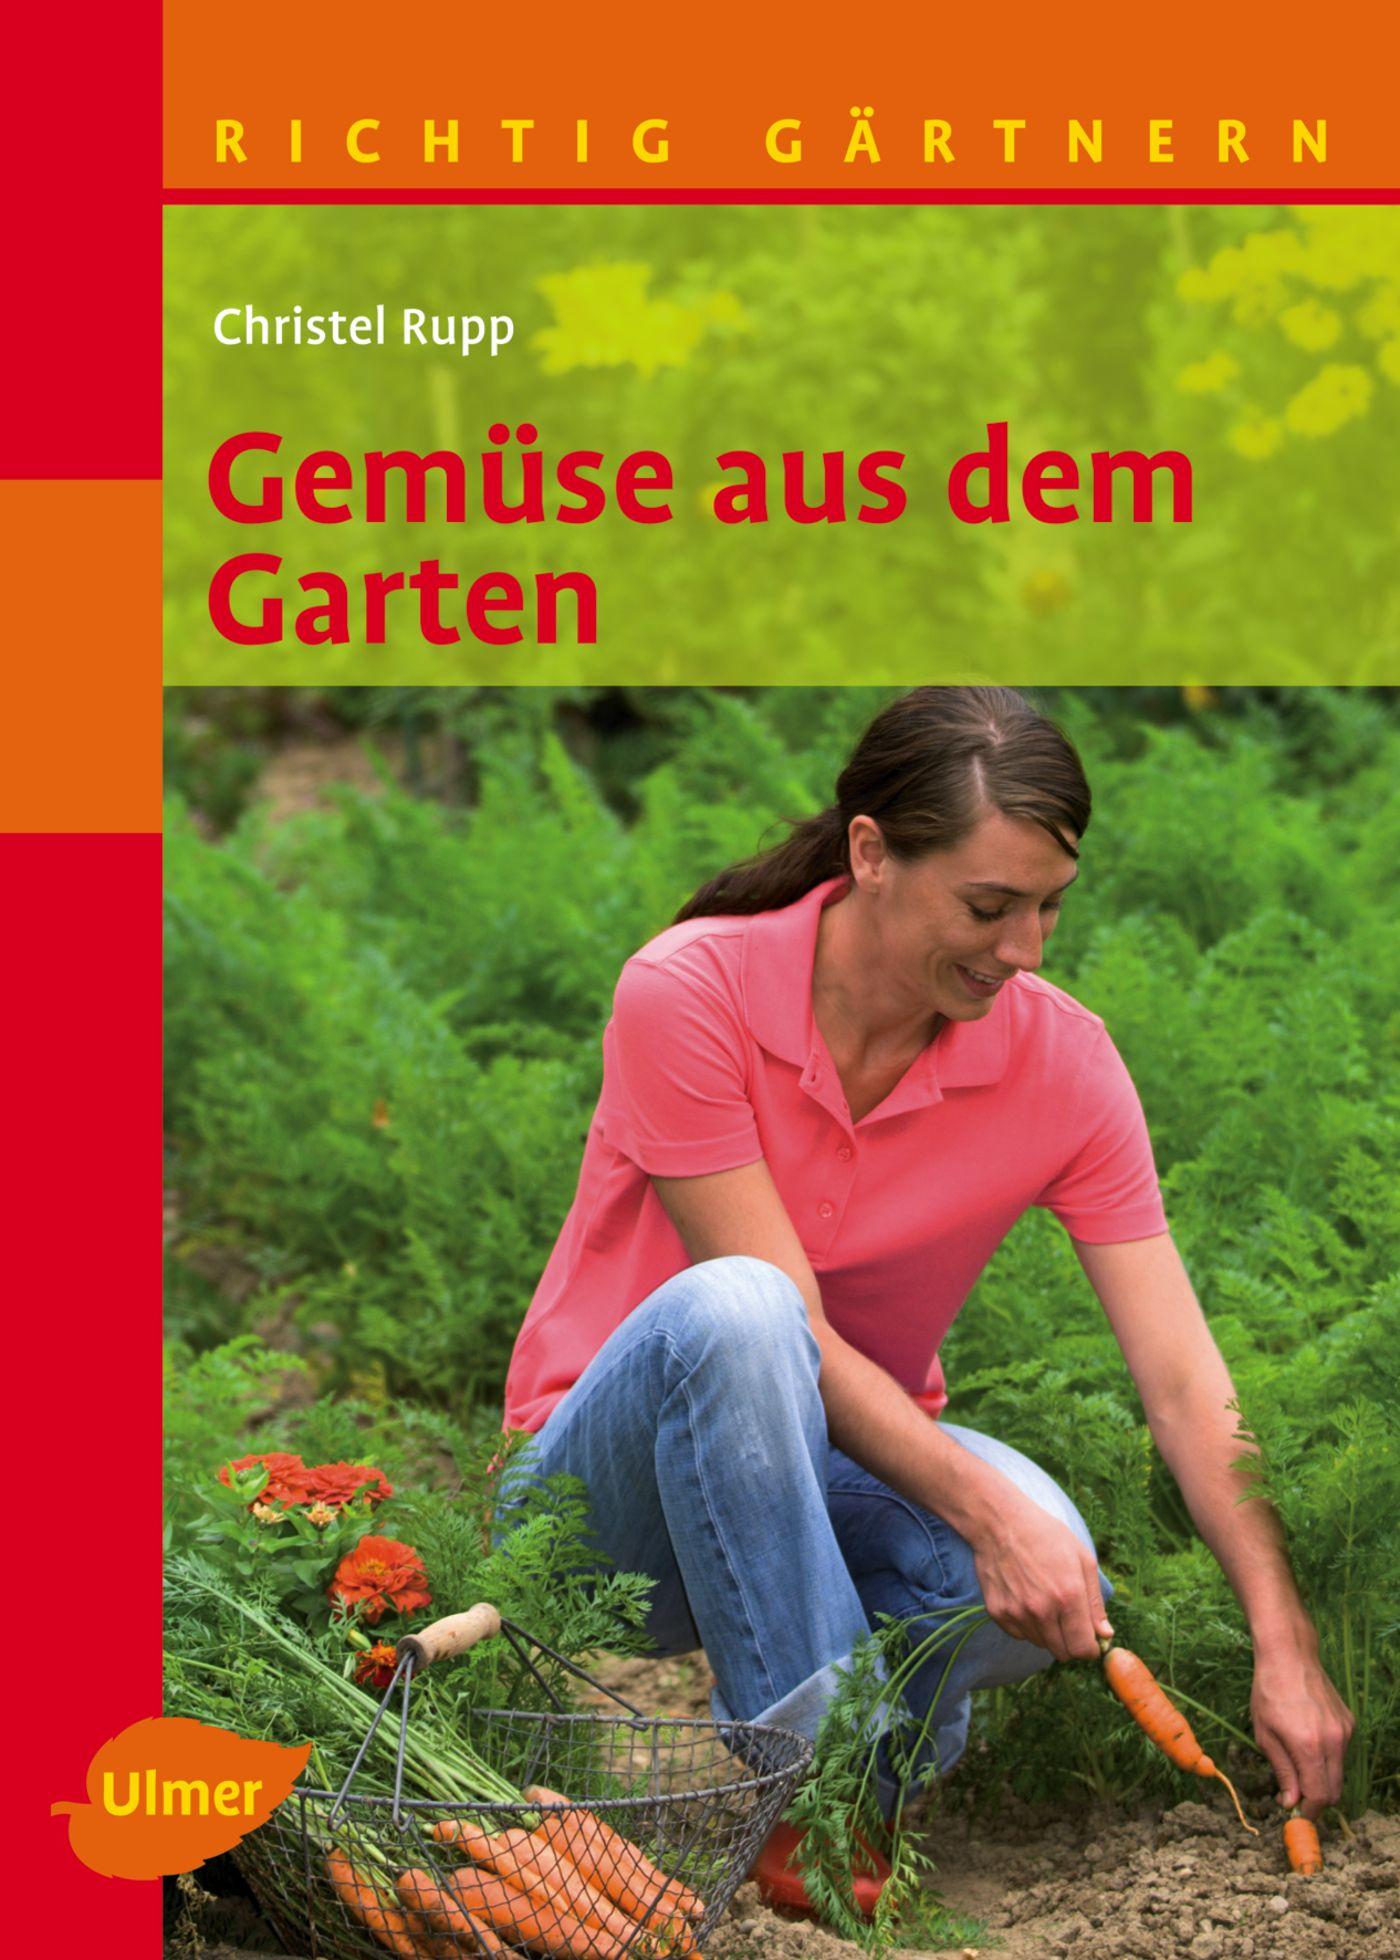 Gemüse aus dem Garten: Richtig gärtnern - Chris...